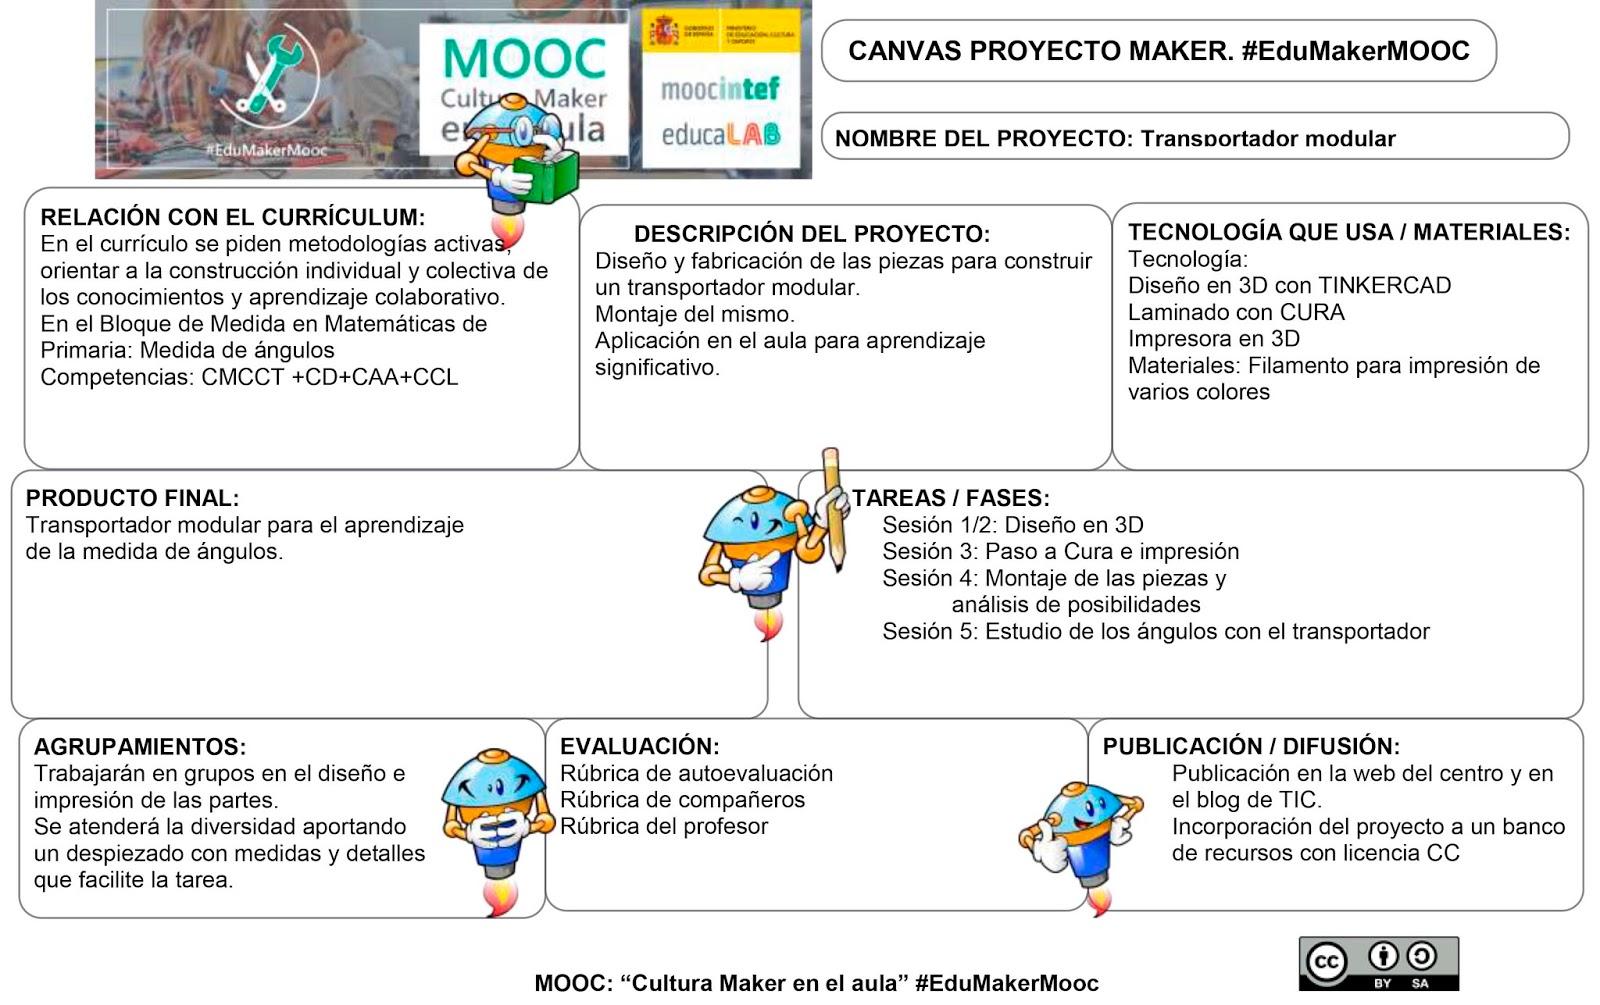 ArgallandoTIC: Reto 4 MOOC Cultura Maker: Análisis de un proyecto